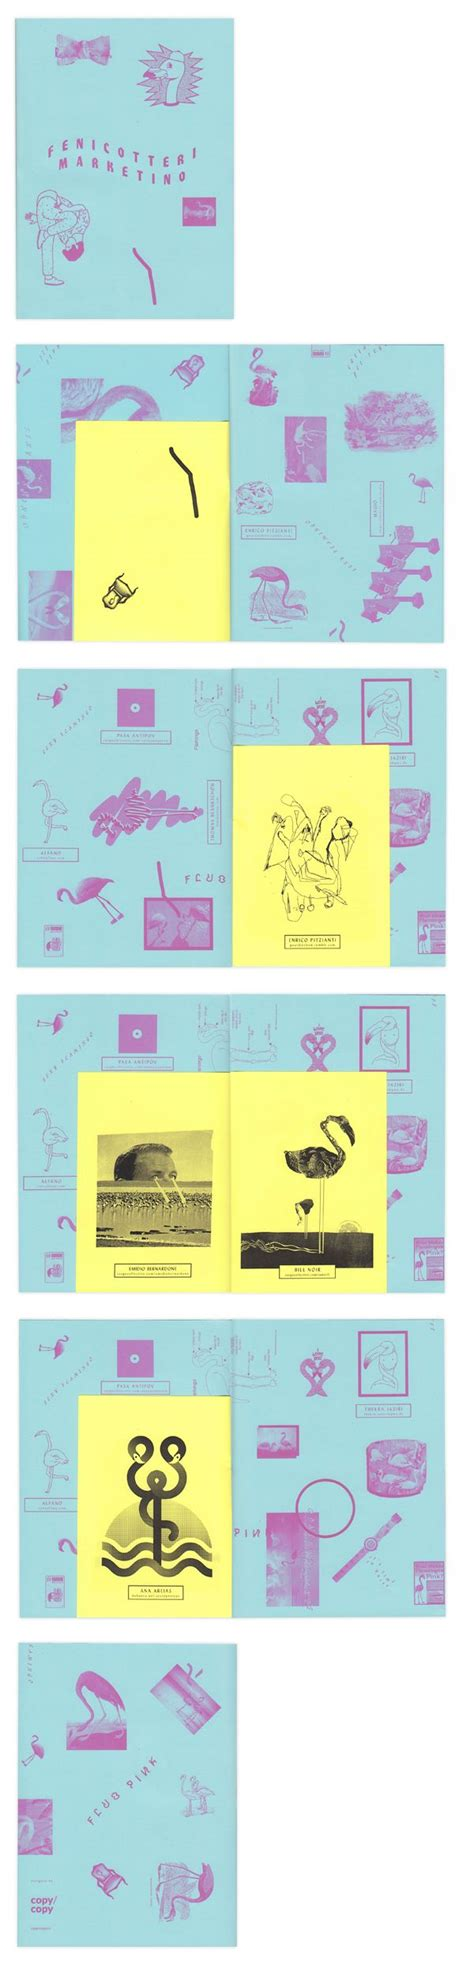 zine layout design 25 best ideas about book printing on pinterest book